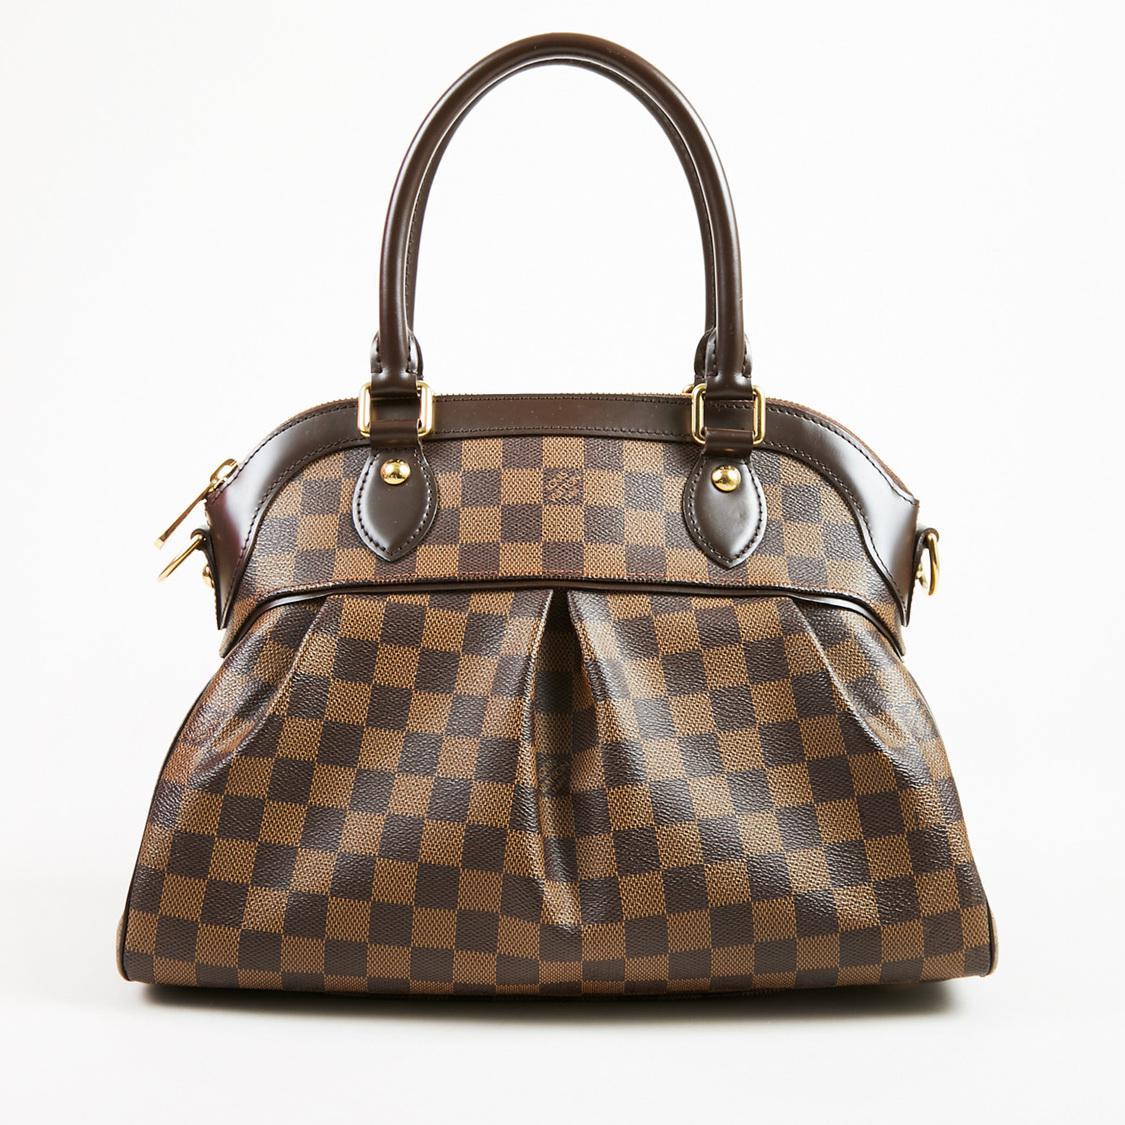 Louis Vuitton. Women s Brown Damier Ebene Coated Canvas Trevi Pm Shoulder  Bag.  3,207  1,530 From Luxury Garage Sale 27a0f02467